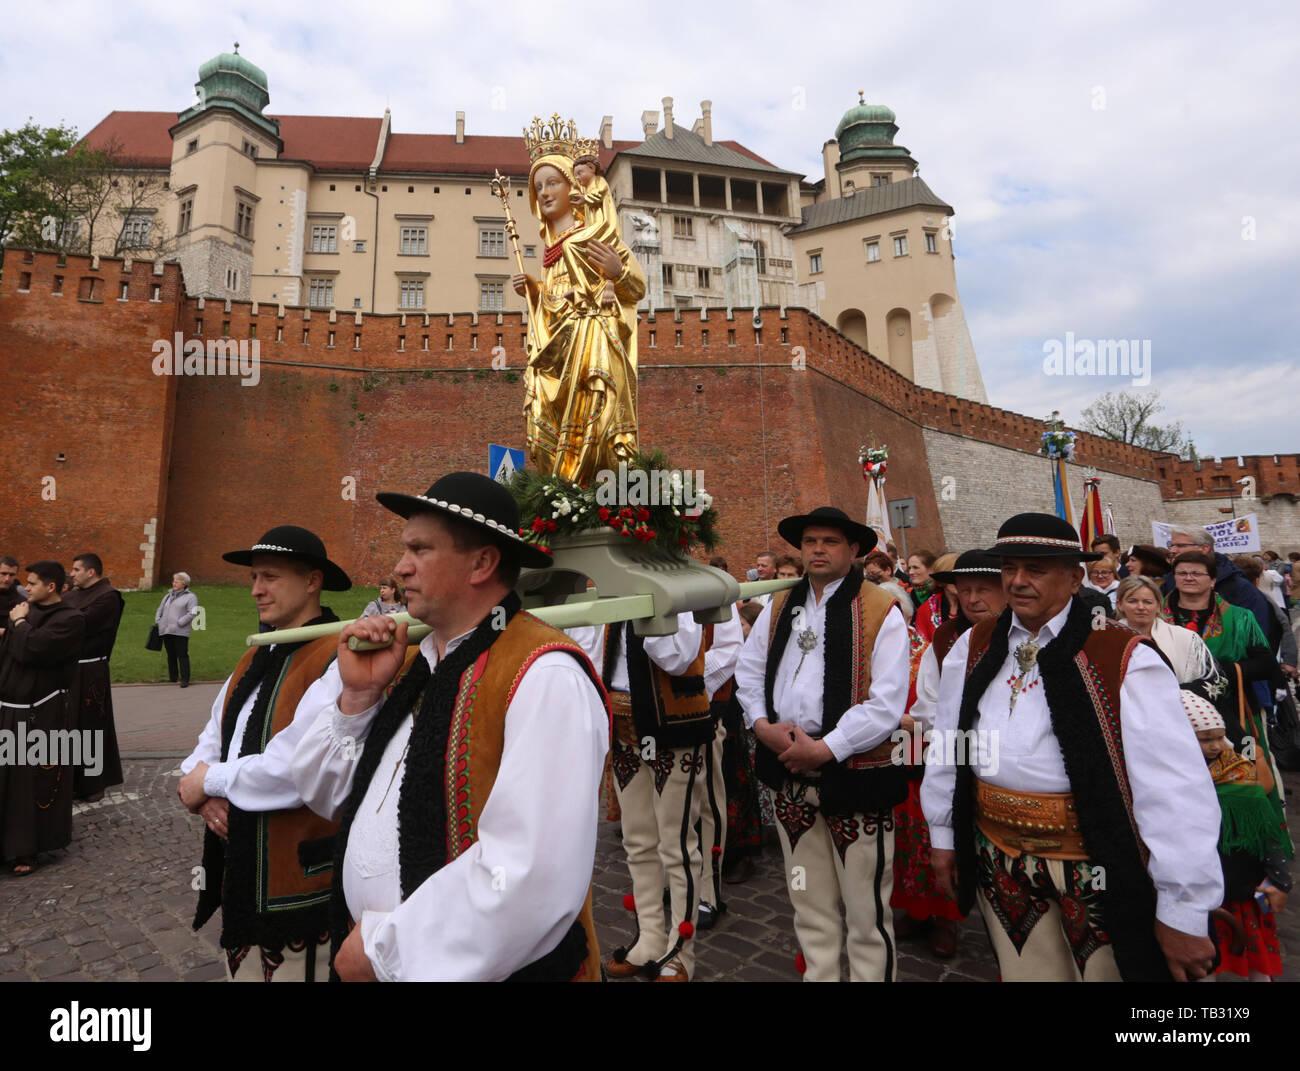 Krakow. Cracow. Poland. St. Stanislaw procession from Wawel to Skalka. Our Lady of Ludzmierz. - Stock Image